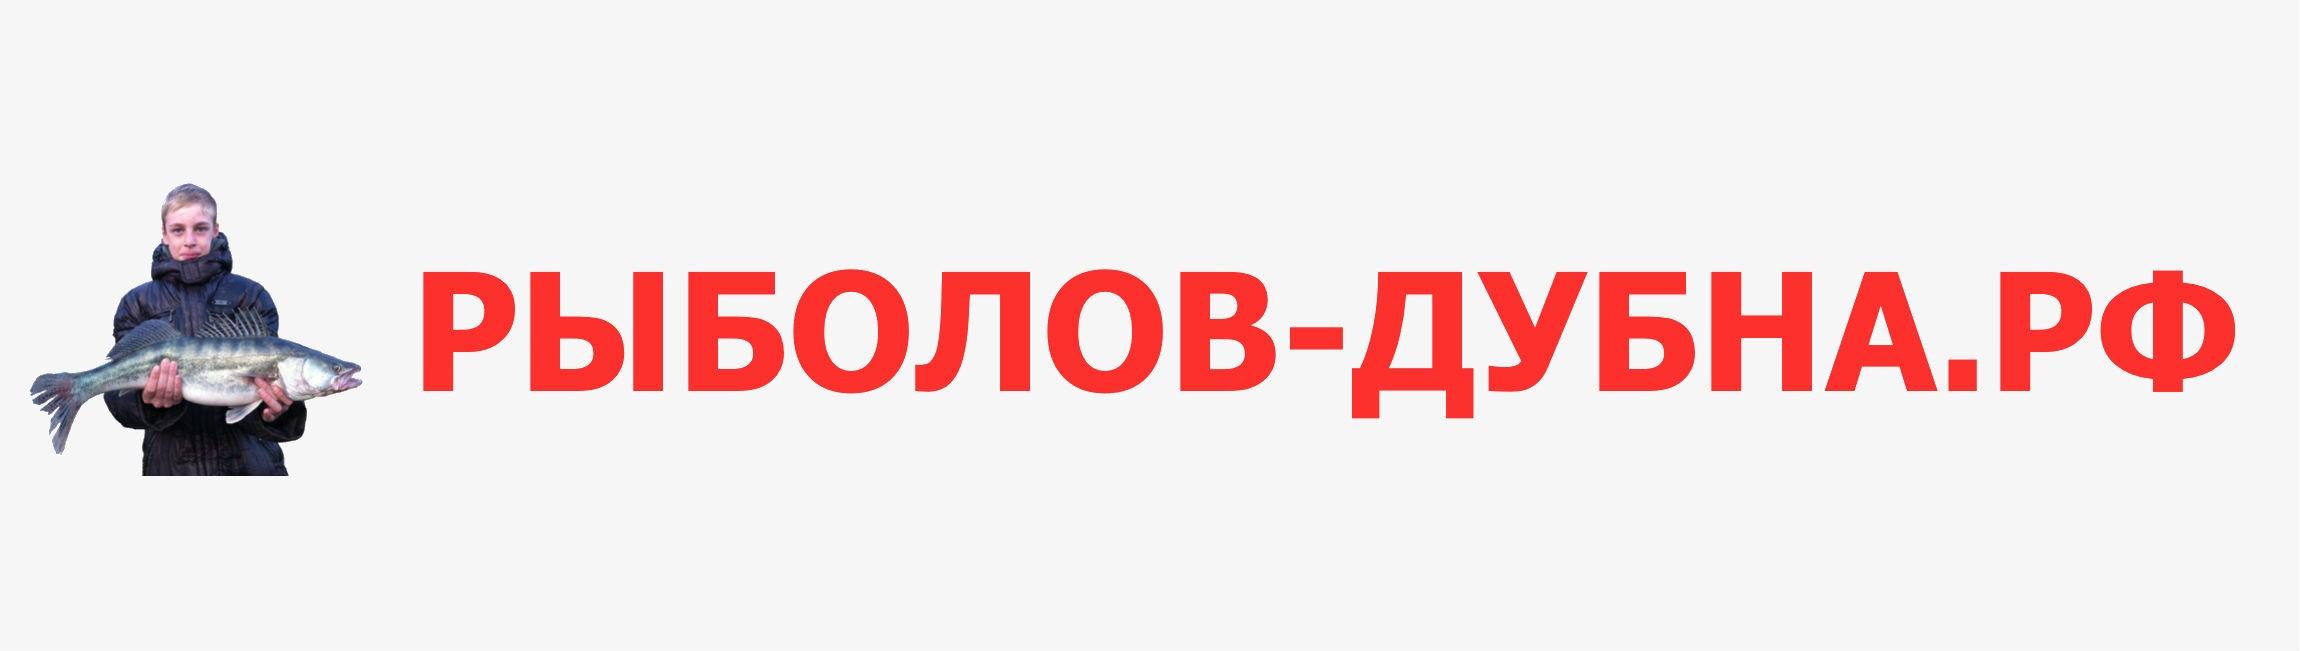 РЫБОЛОВ-ДУБНА